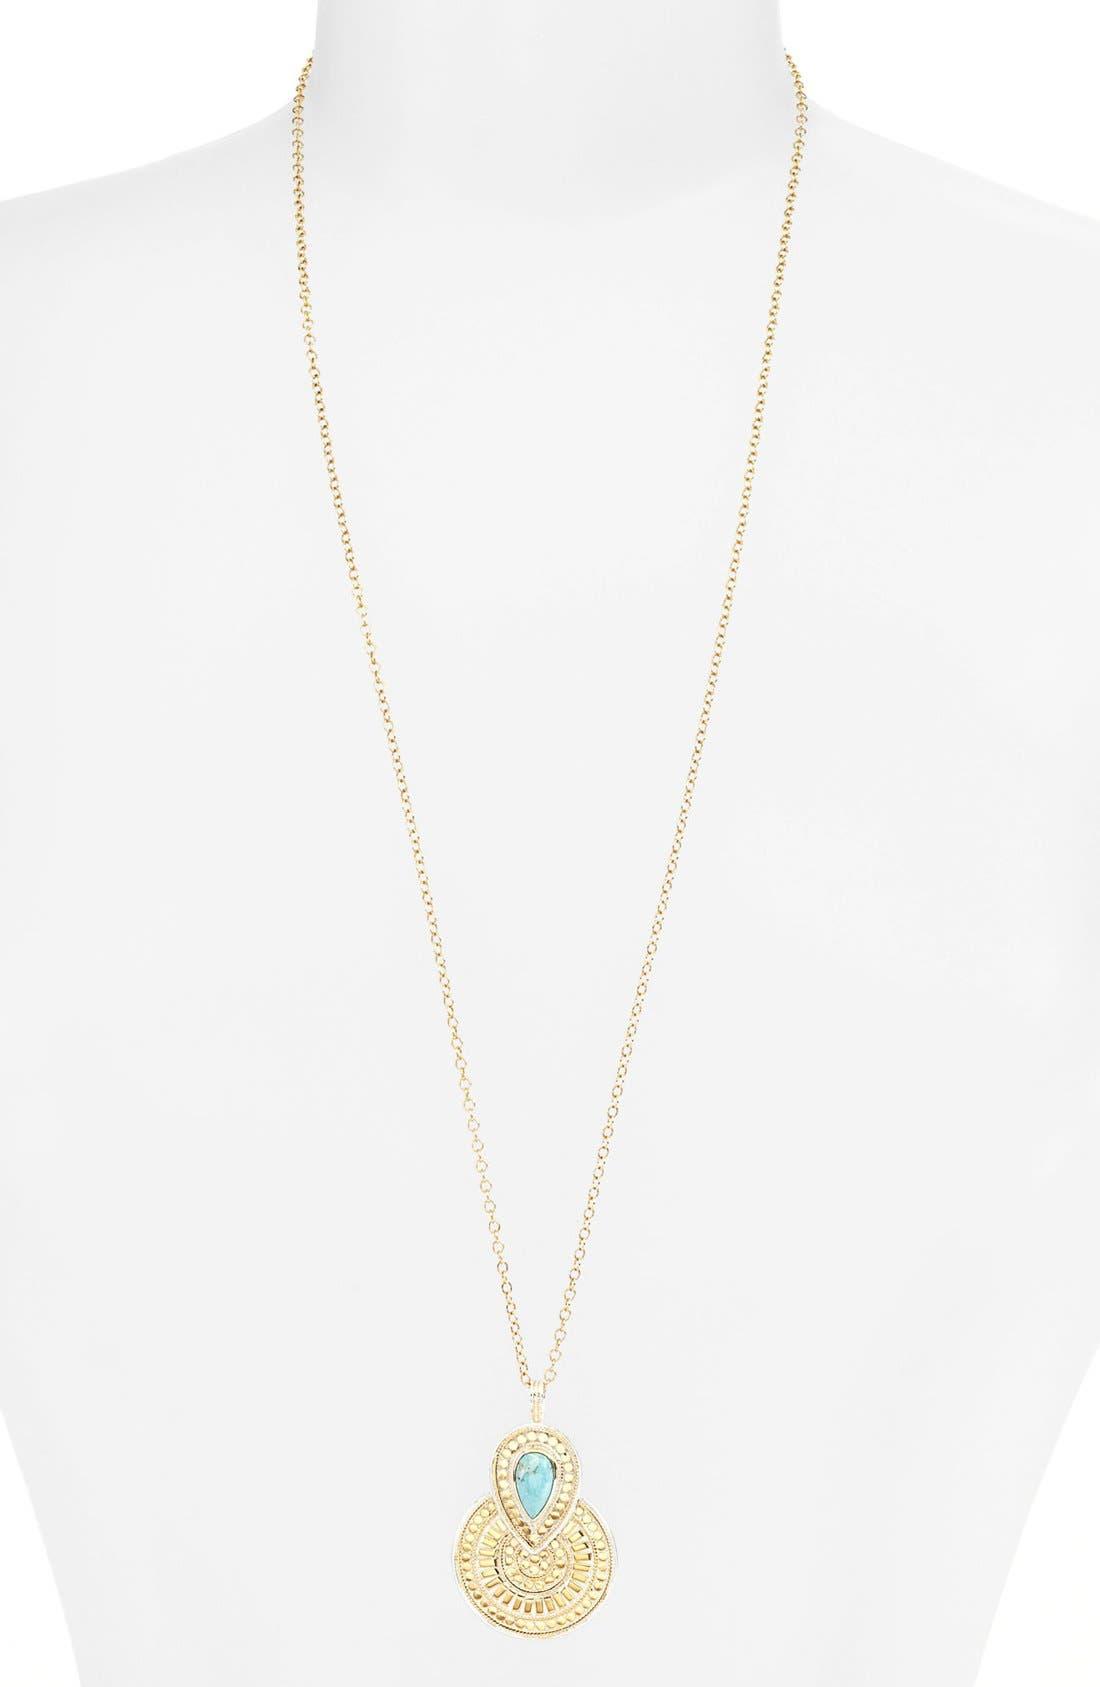 Main Image - Anna Beck 'Gili' Long Pendant Necklace